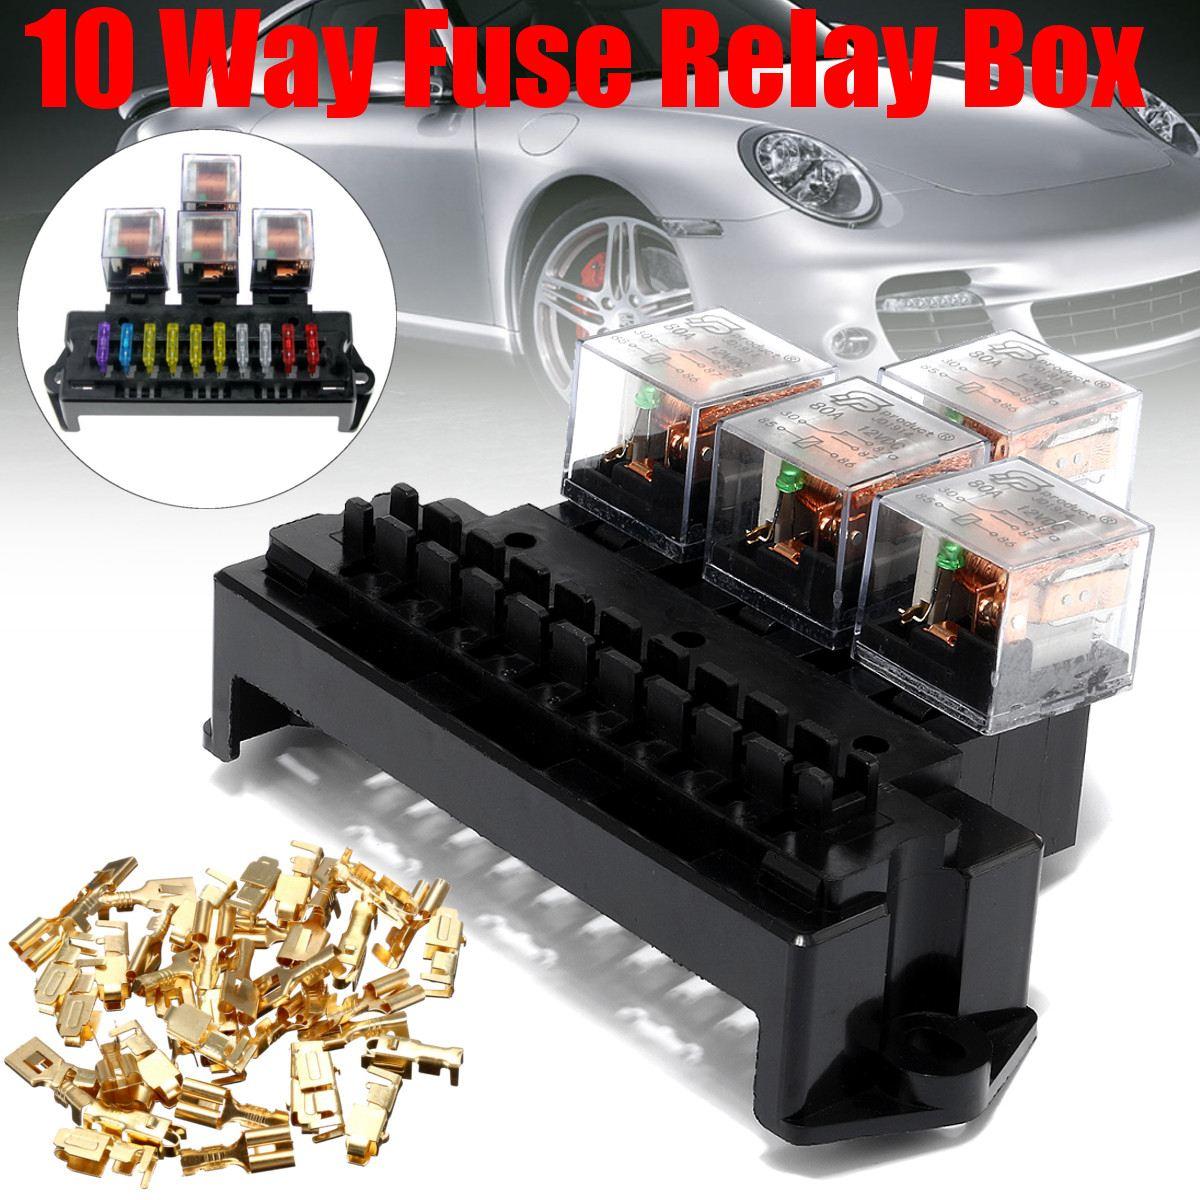 10 way fuse safety box 4 relay box holder block automotive black circuit protector terminals car [ 1200 x 1200 Pixel ]